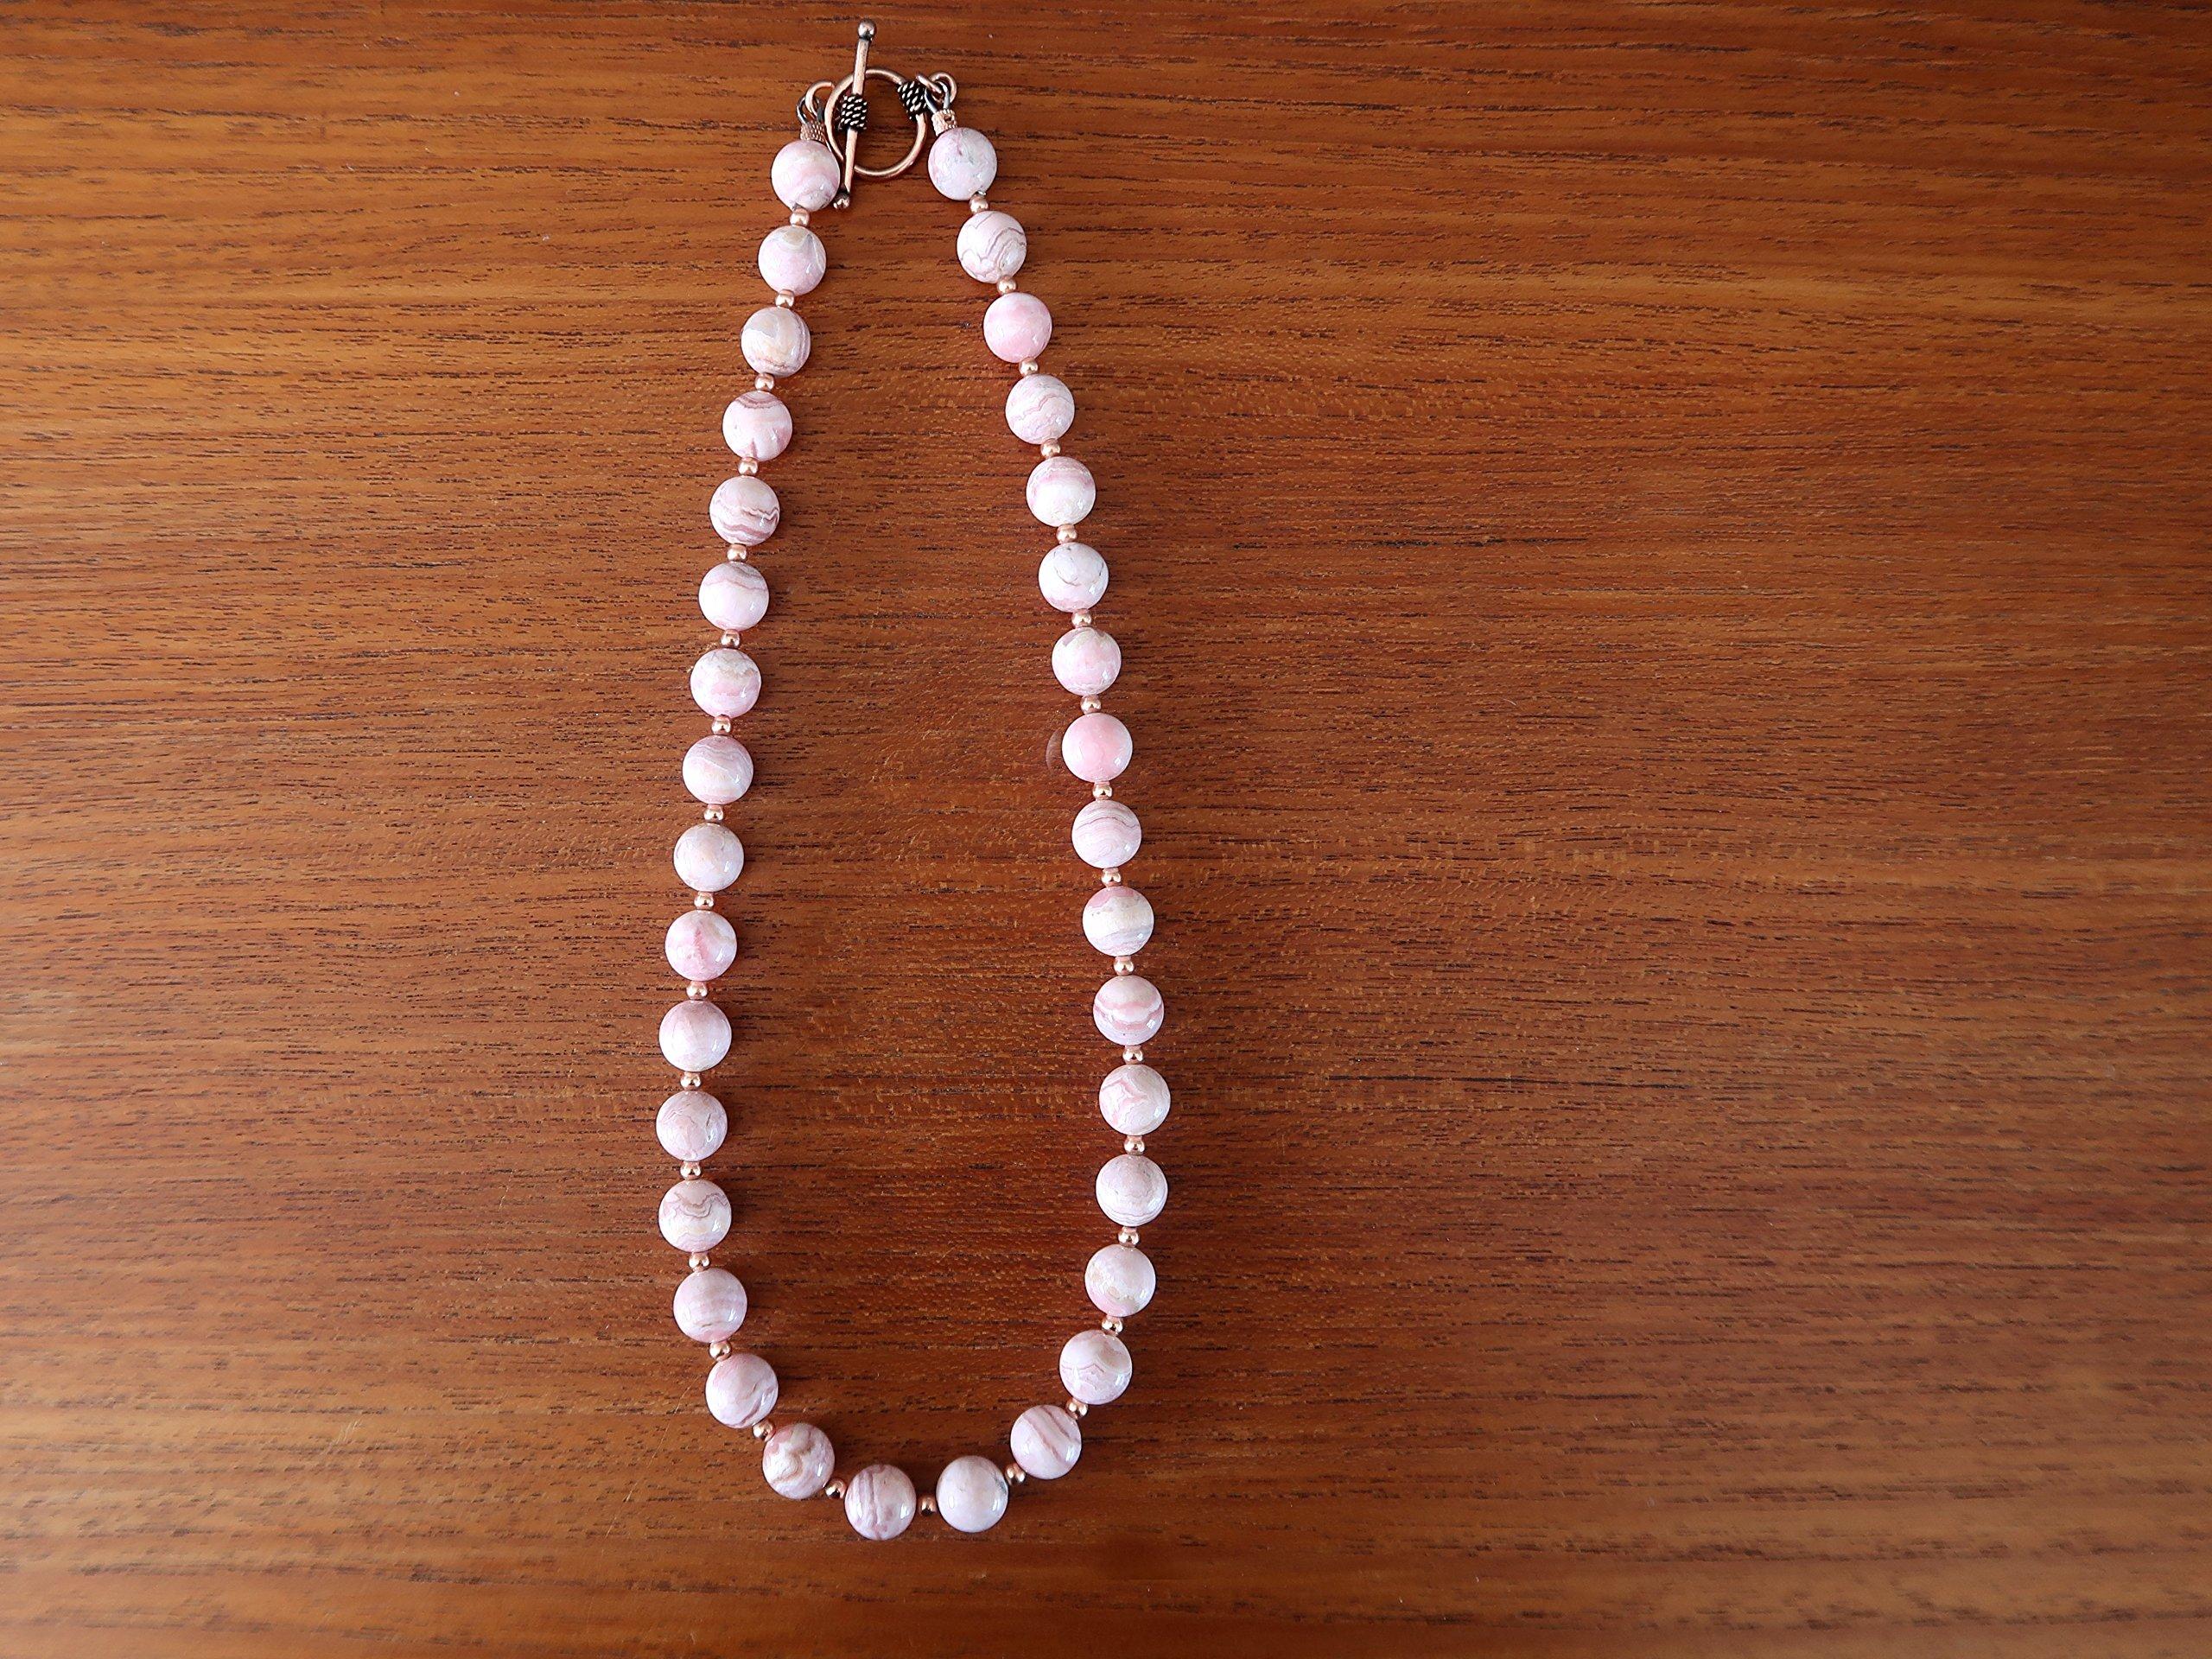 Satin Crystals Rhodochrosite Necklace Boutique Deluxe Pink Genuine Gemstone Round Beaded Copper B01 (17) by SatinCrystals (Image #3)